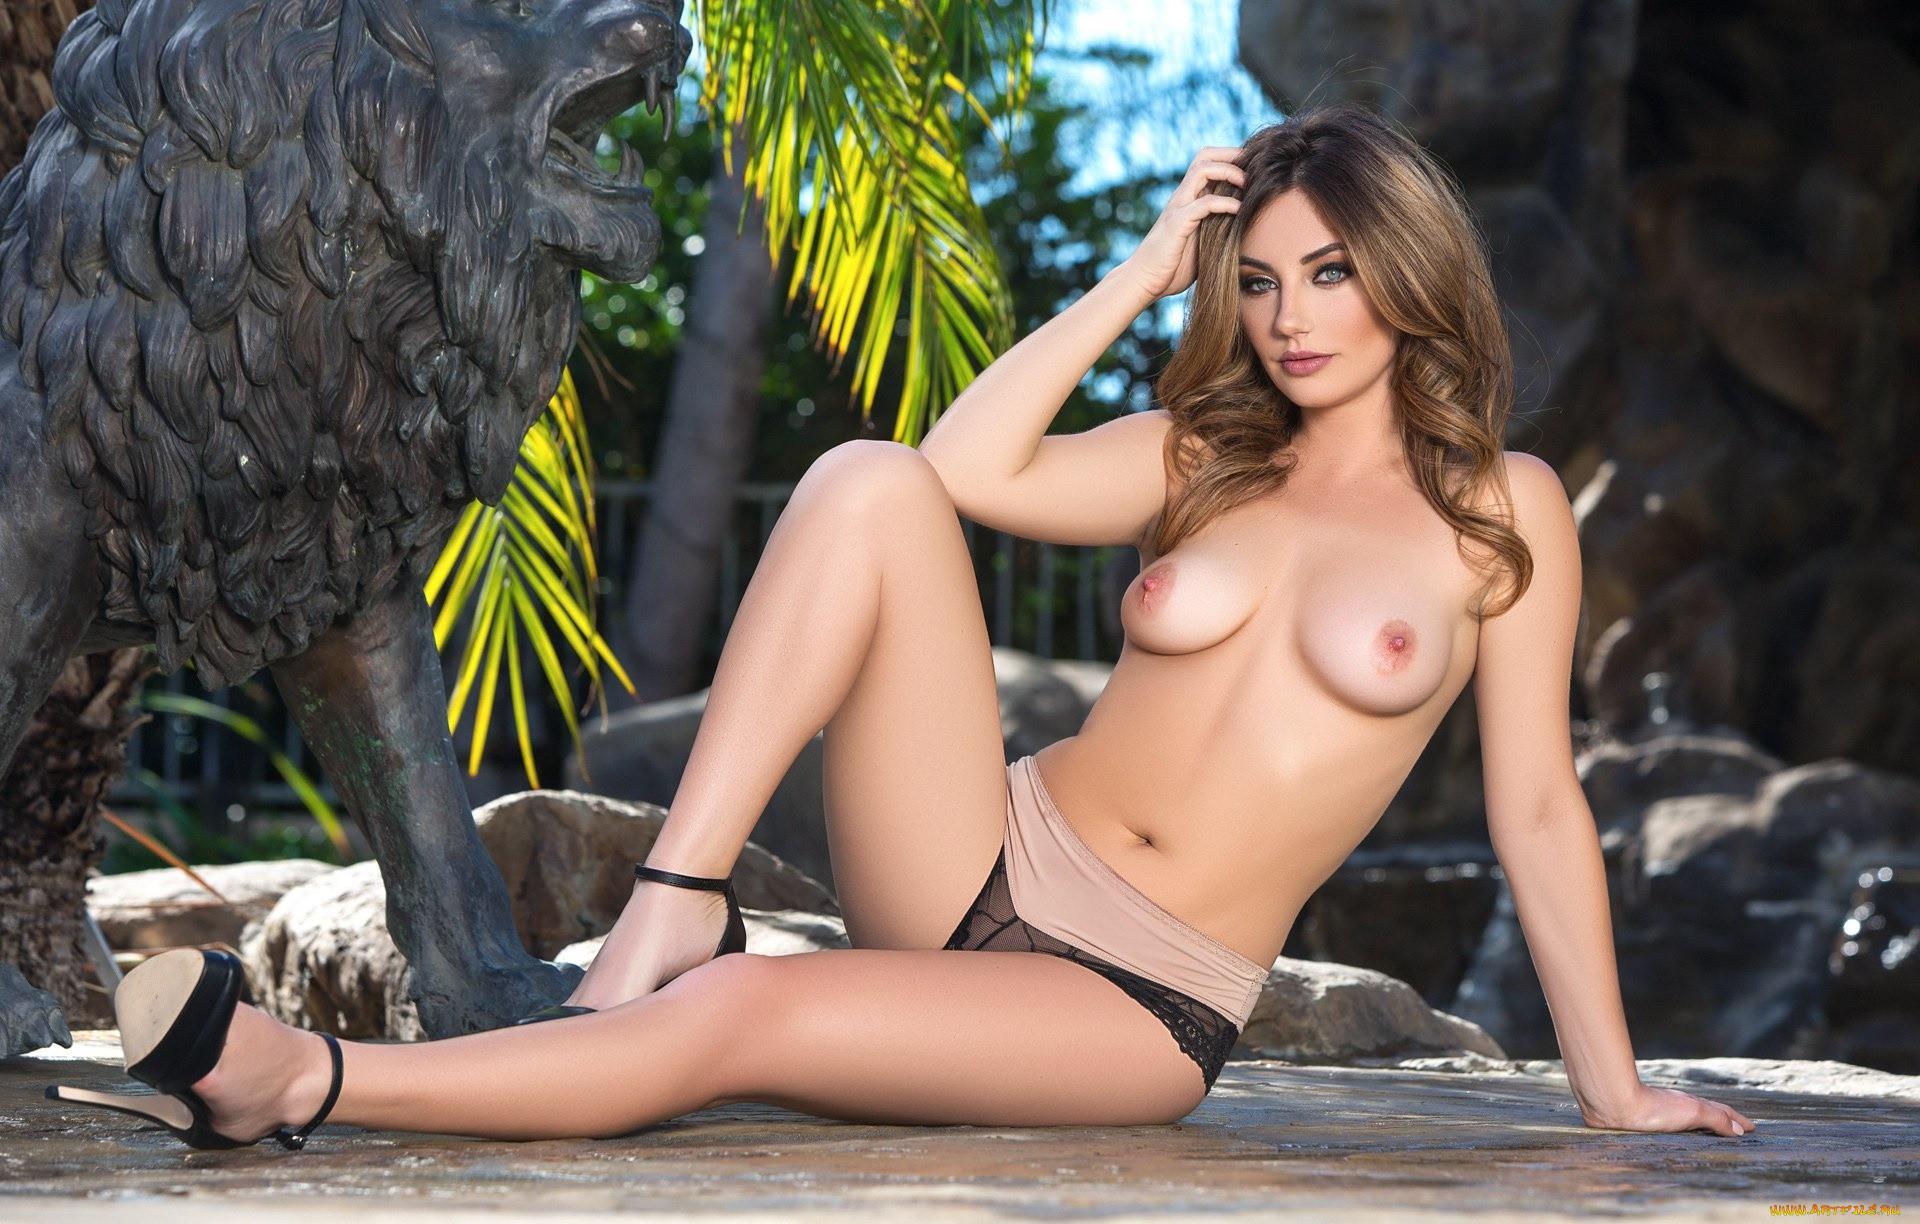 Lauren gottlieb hot unseen bikini, bra gq photoshoot